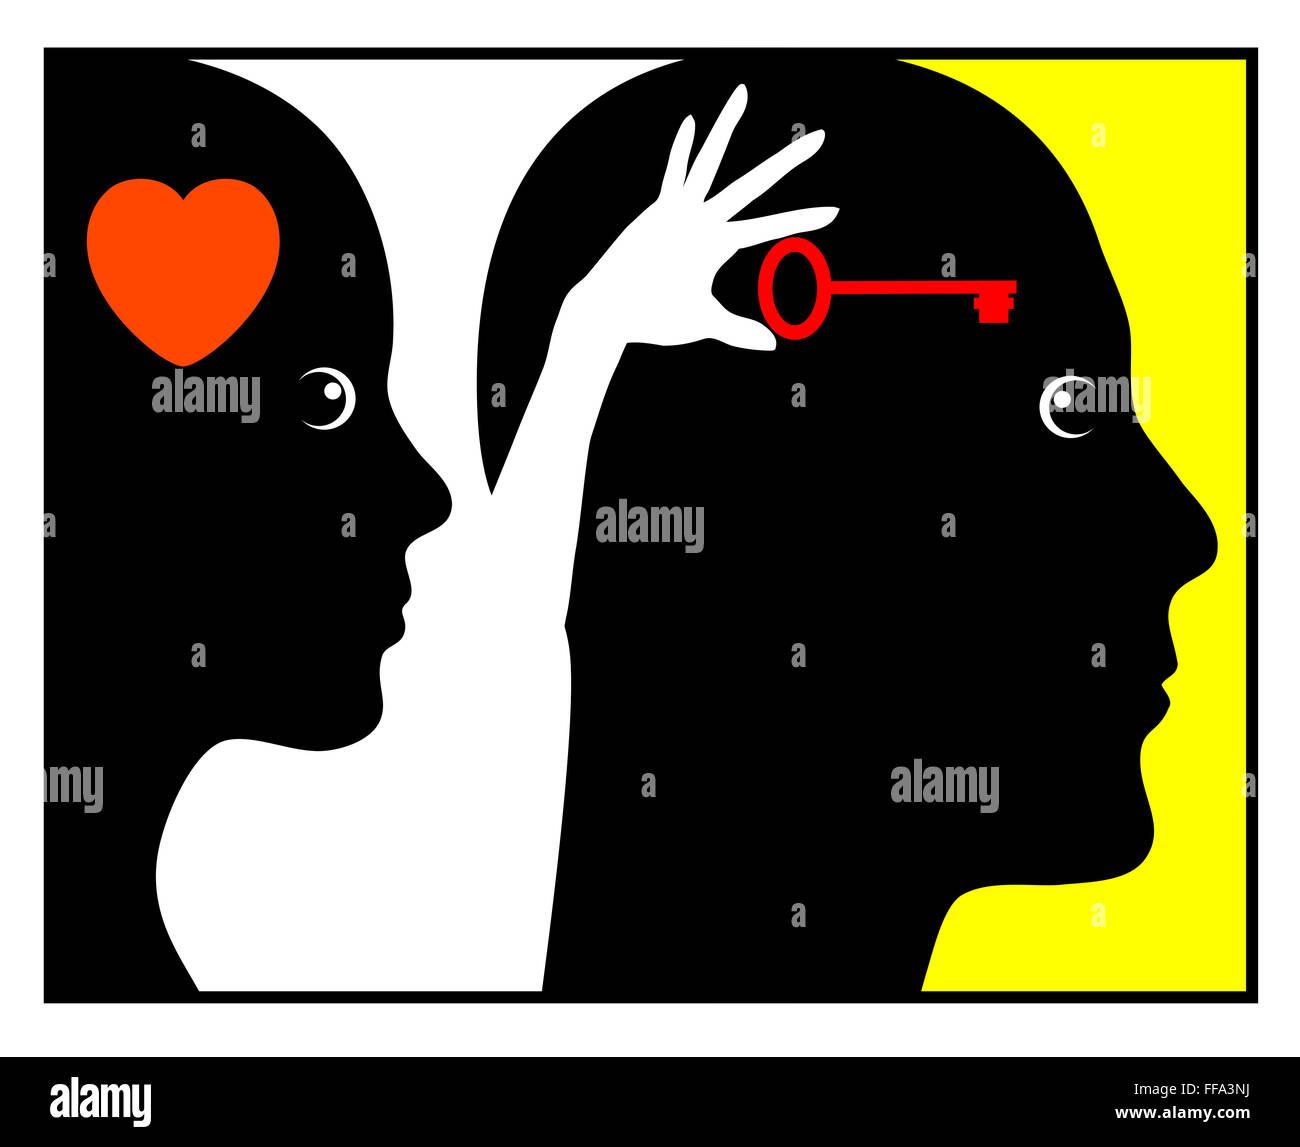 Psychology of Love - Stock Image